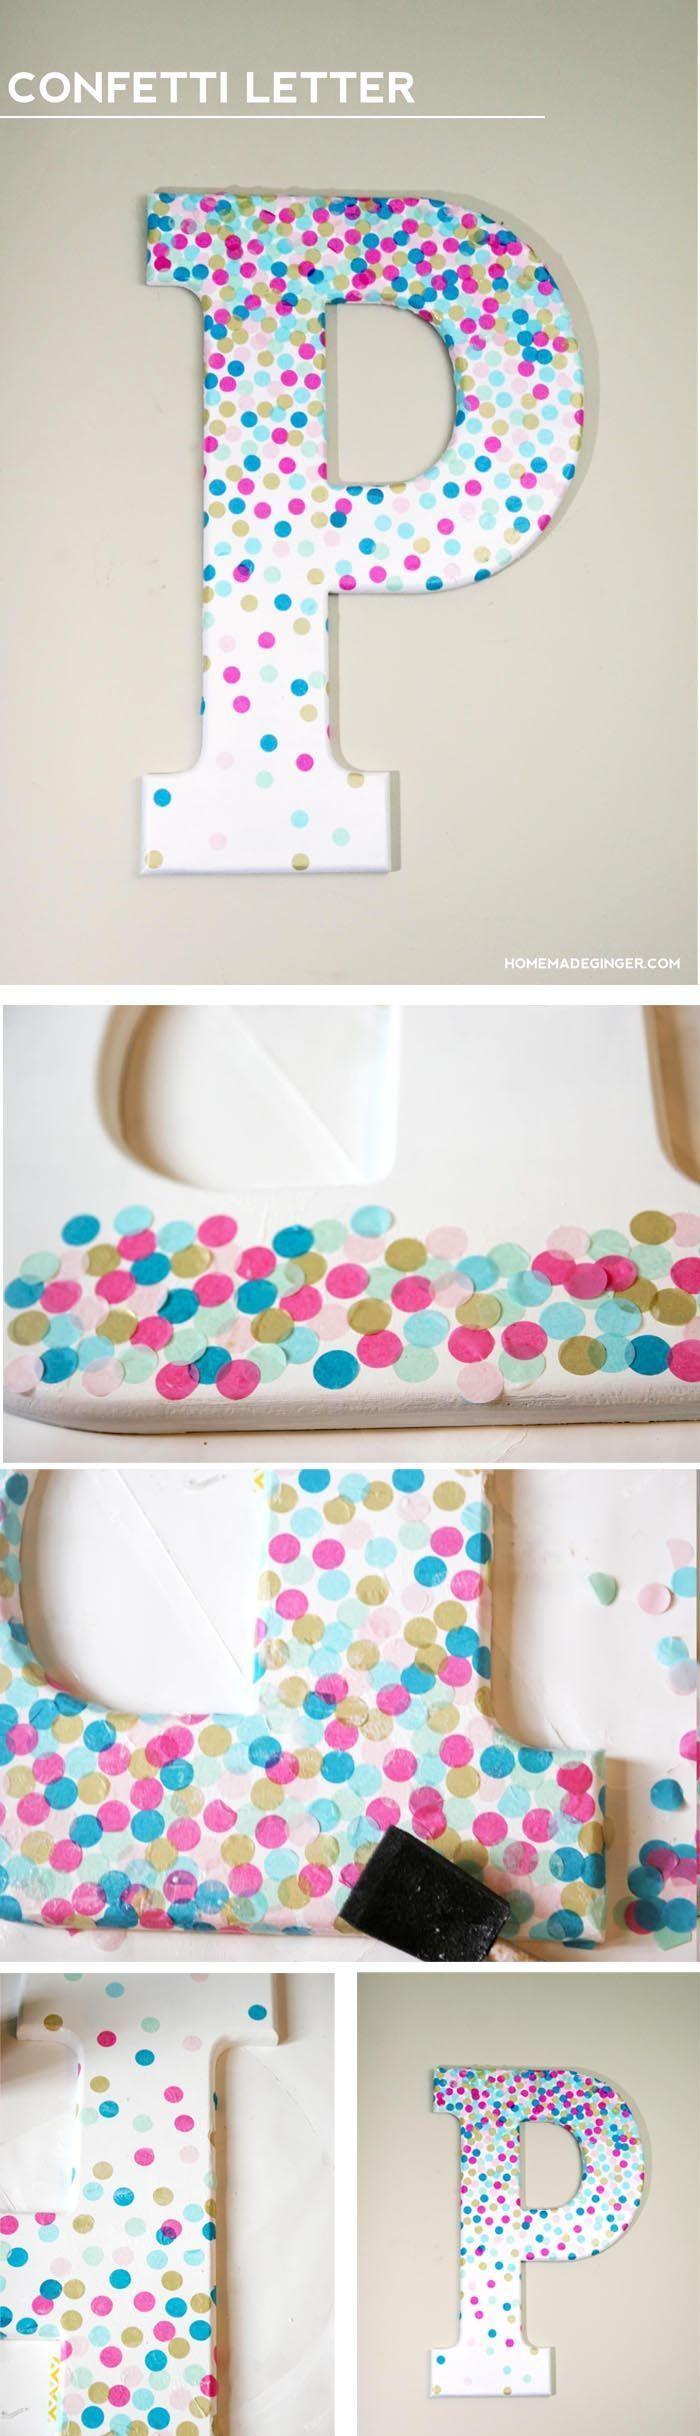 diy wall art confetti letter polka dot party ideas pinterest